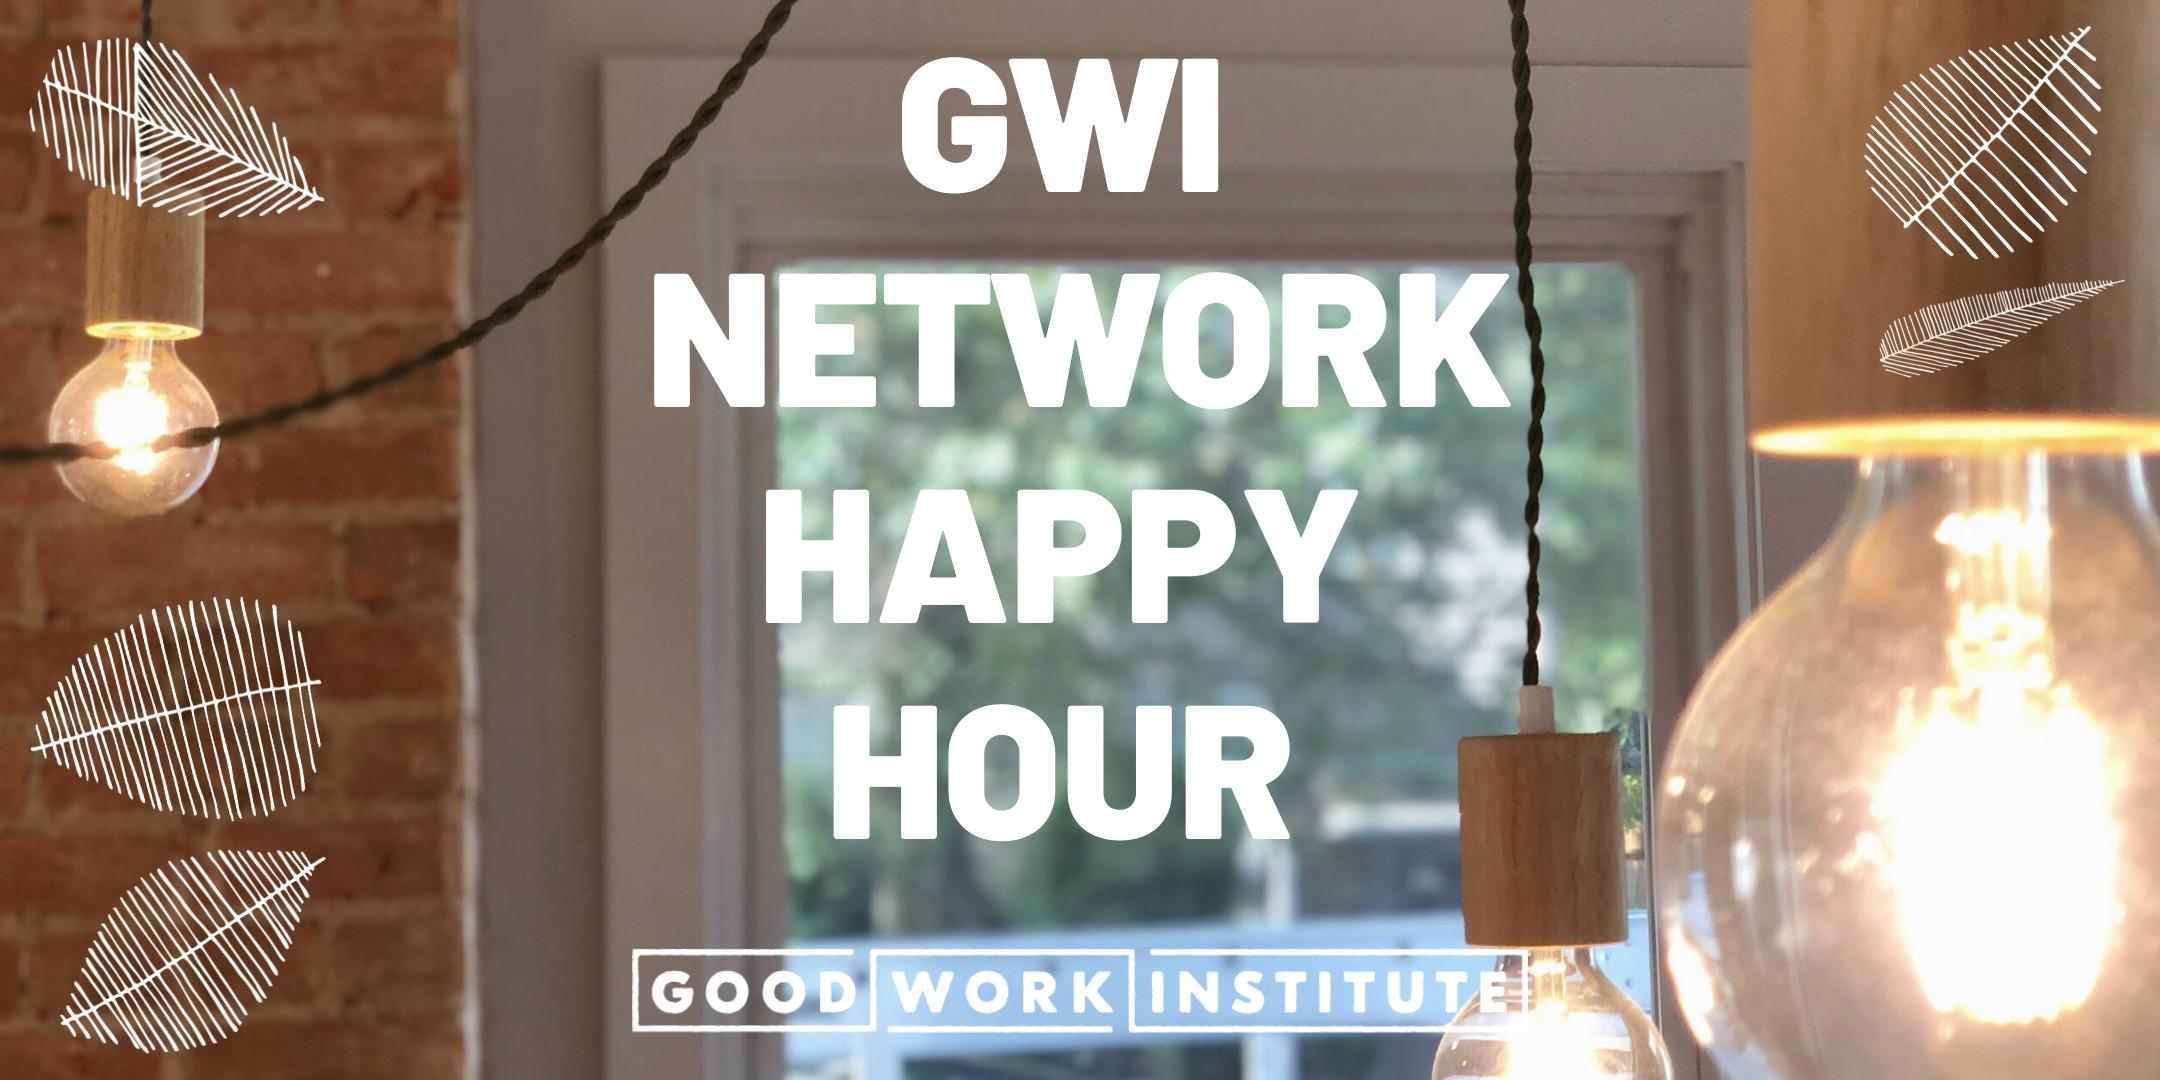 GWI Network Happy Hour